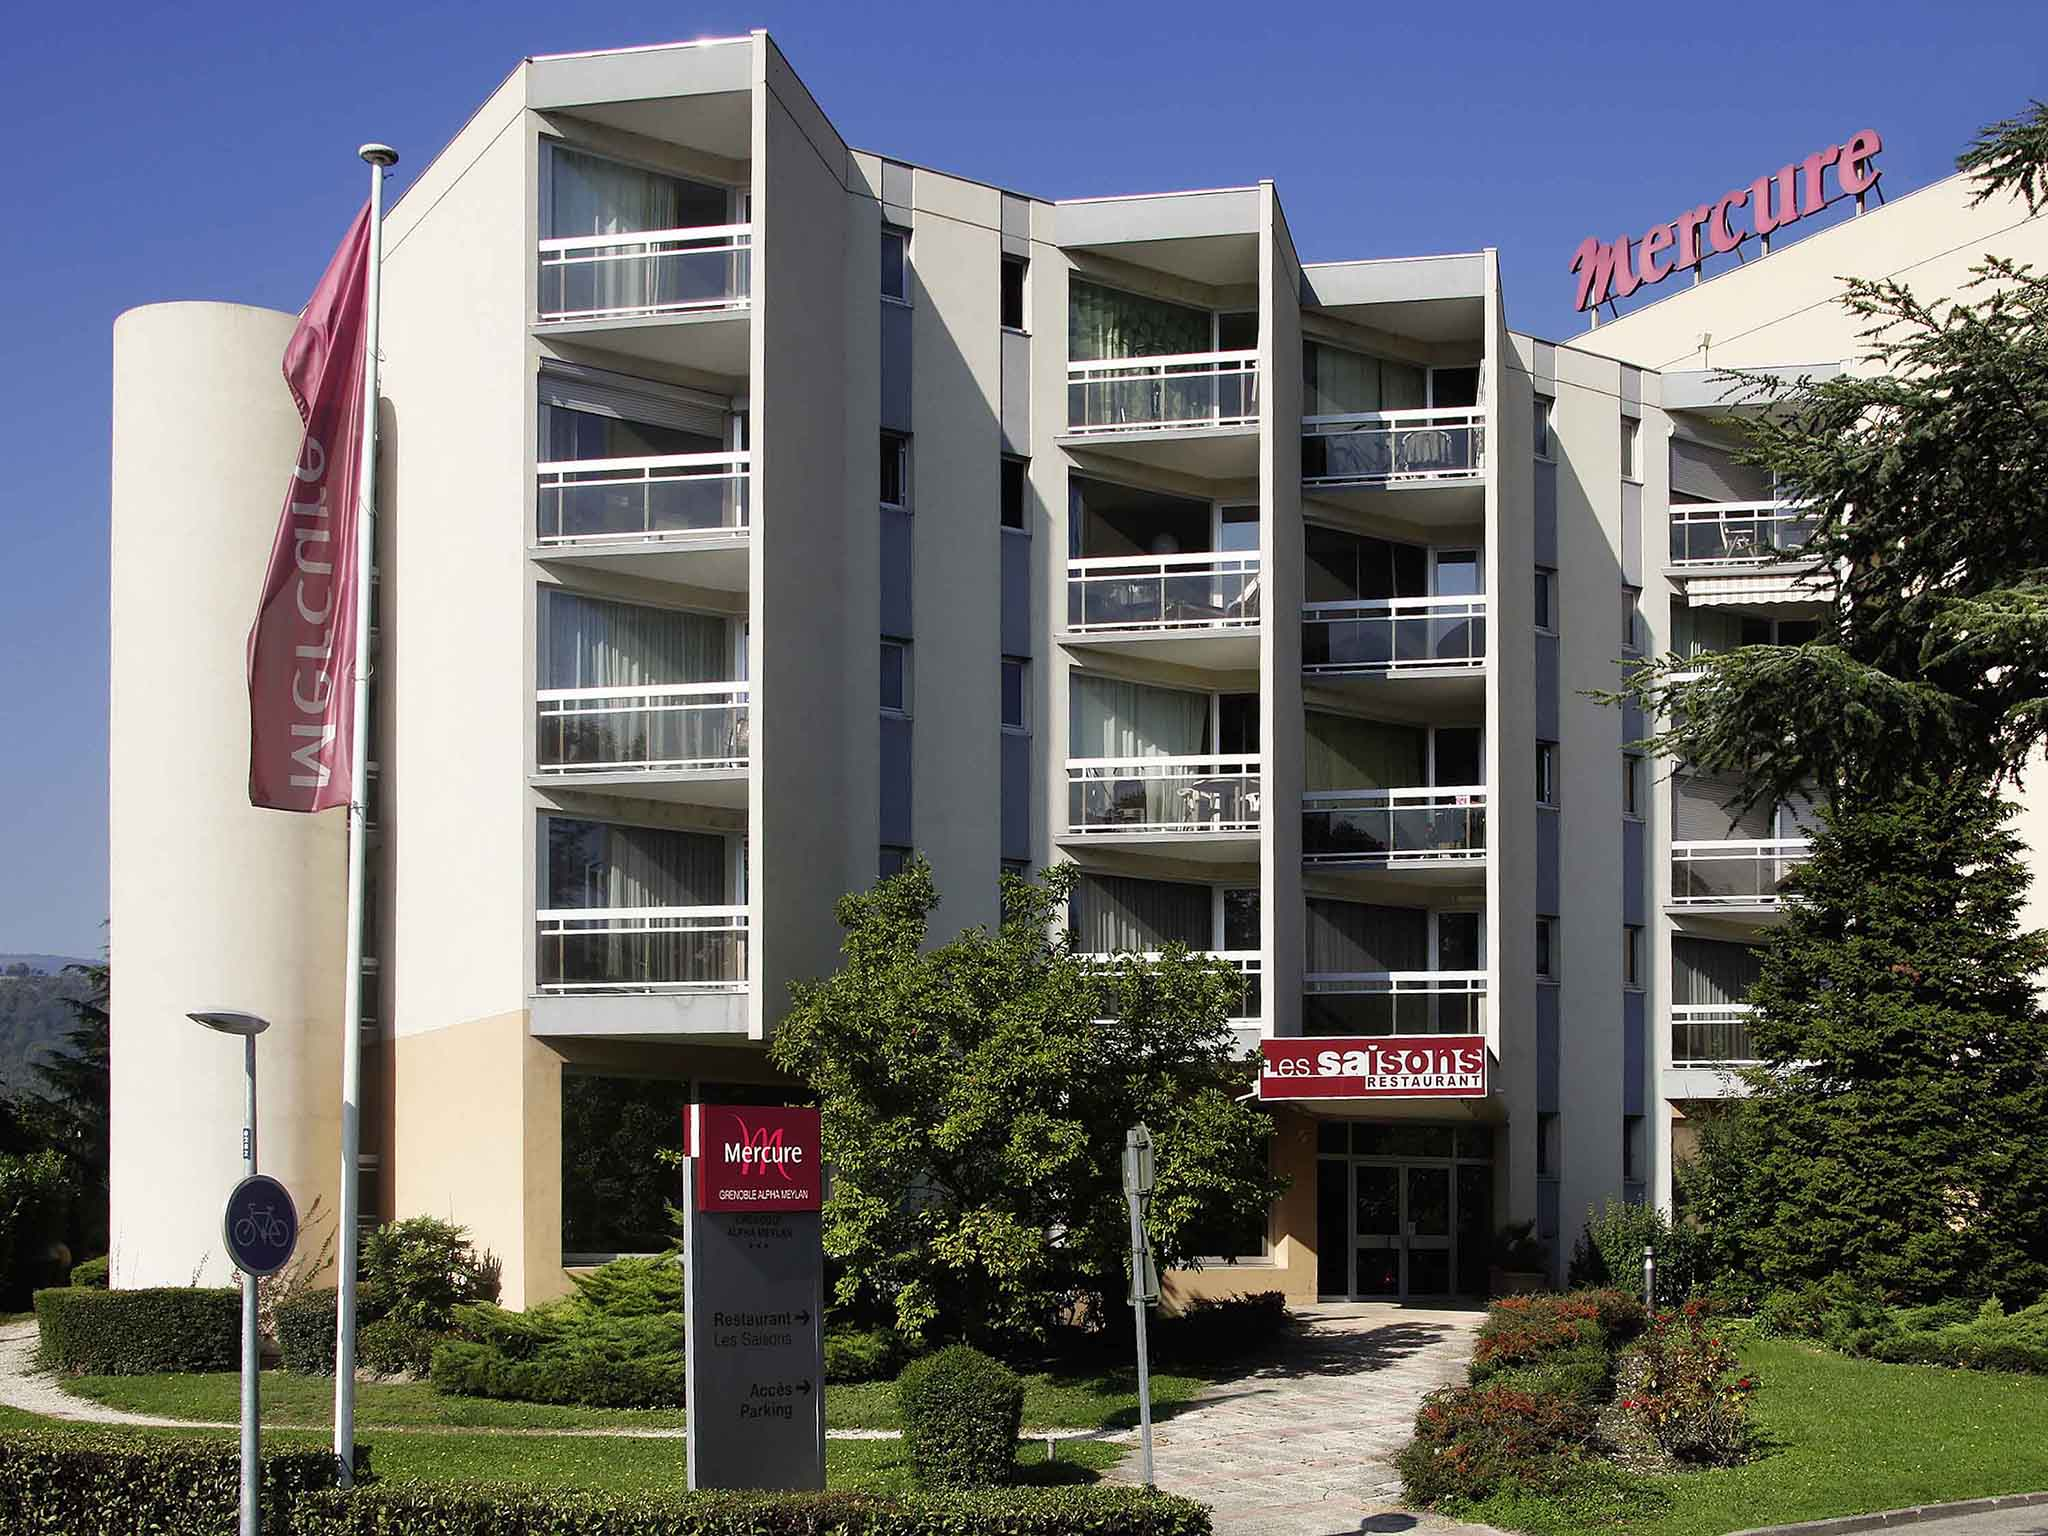 Hotel meylan pas cher for Appart hotel pas cher paris